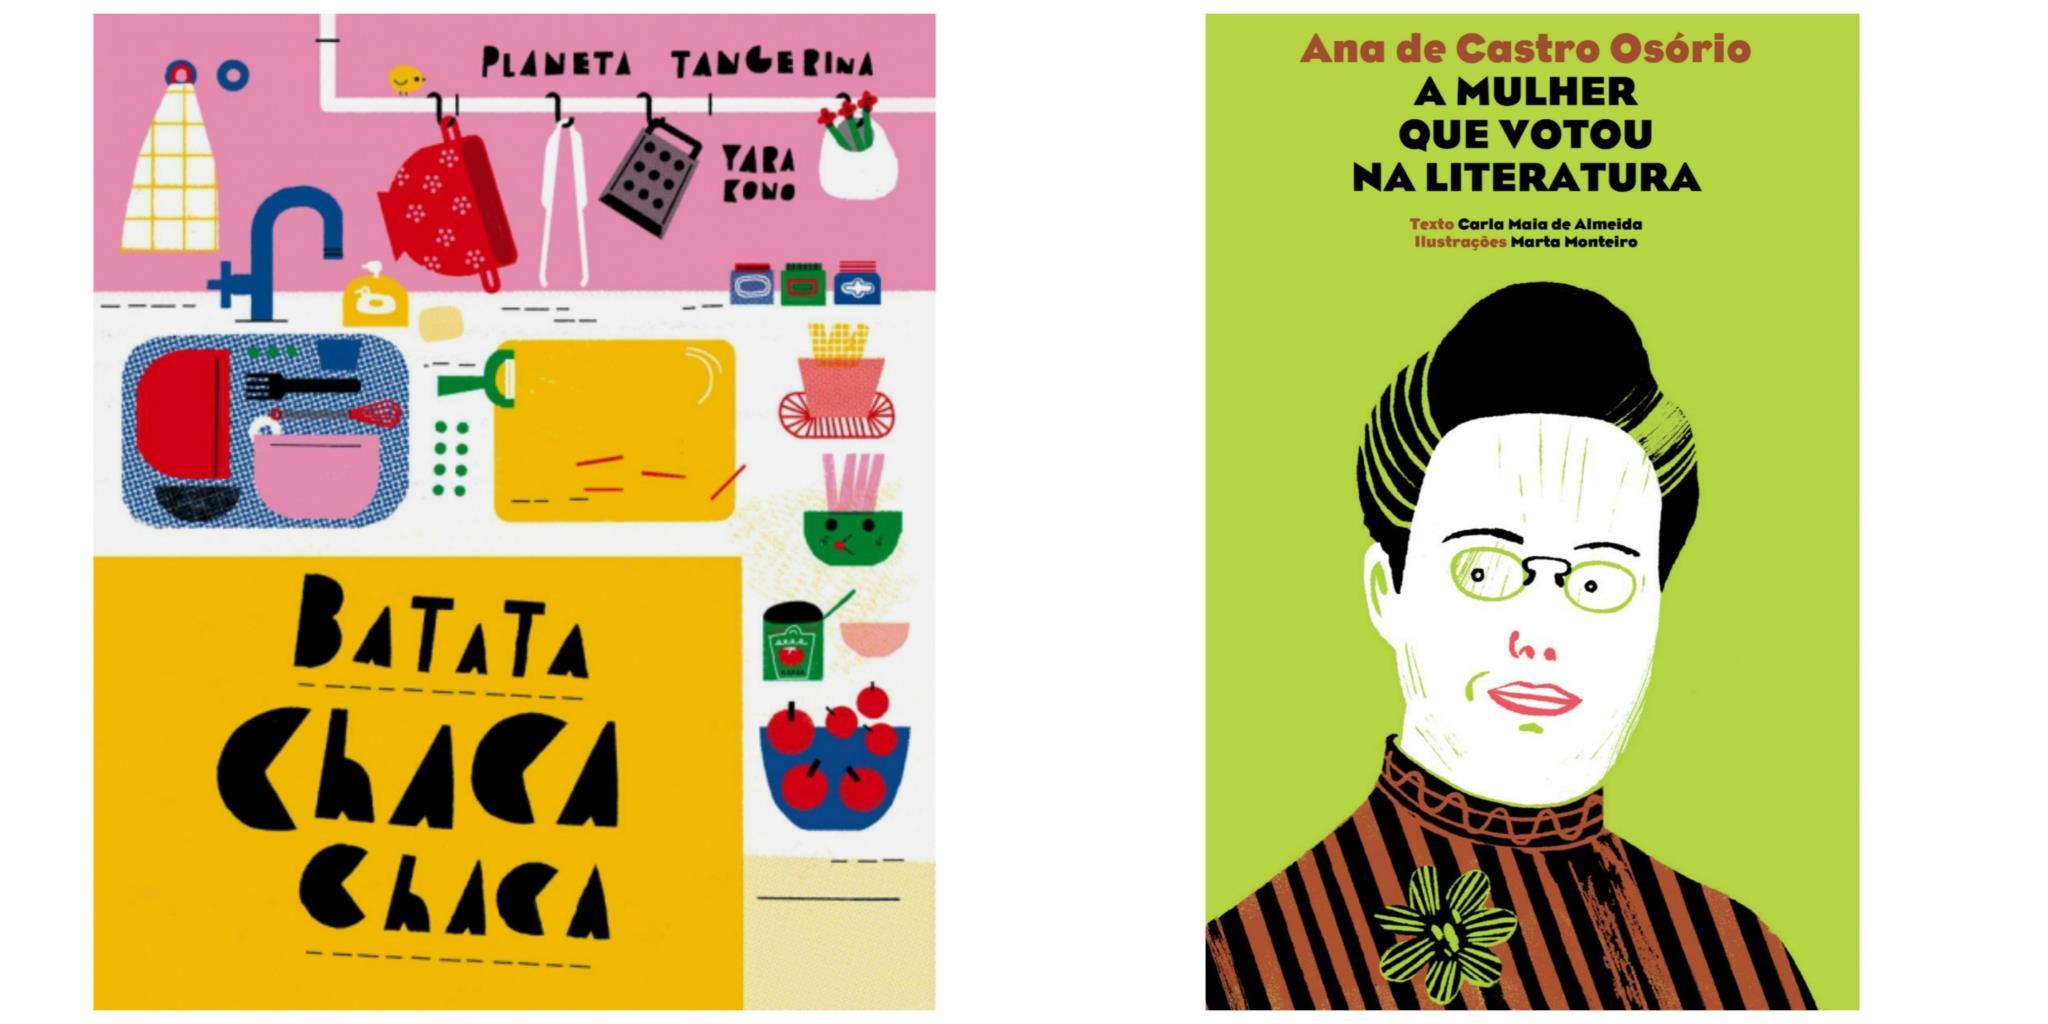 PÚBLICO - Yara Kono e Marta Monteiro seleccionadas para Feira do Livro de Bolonha